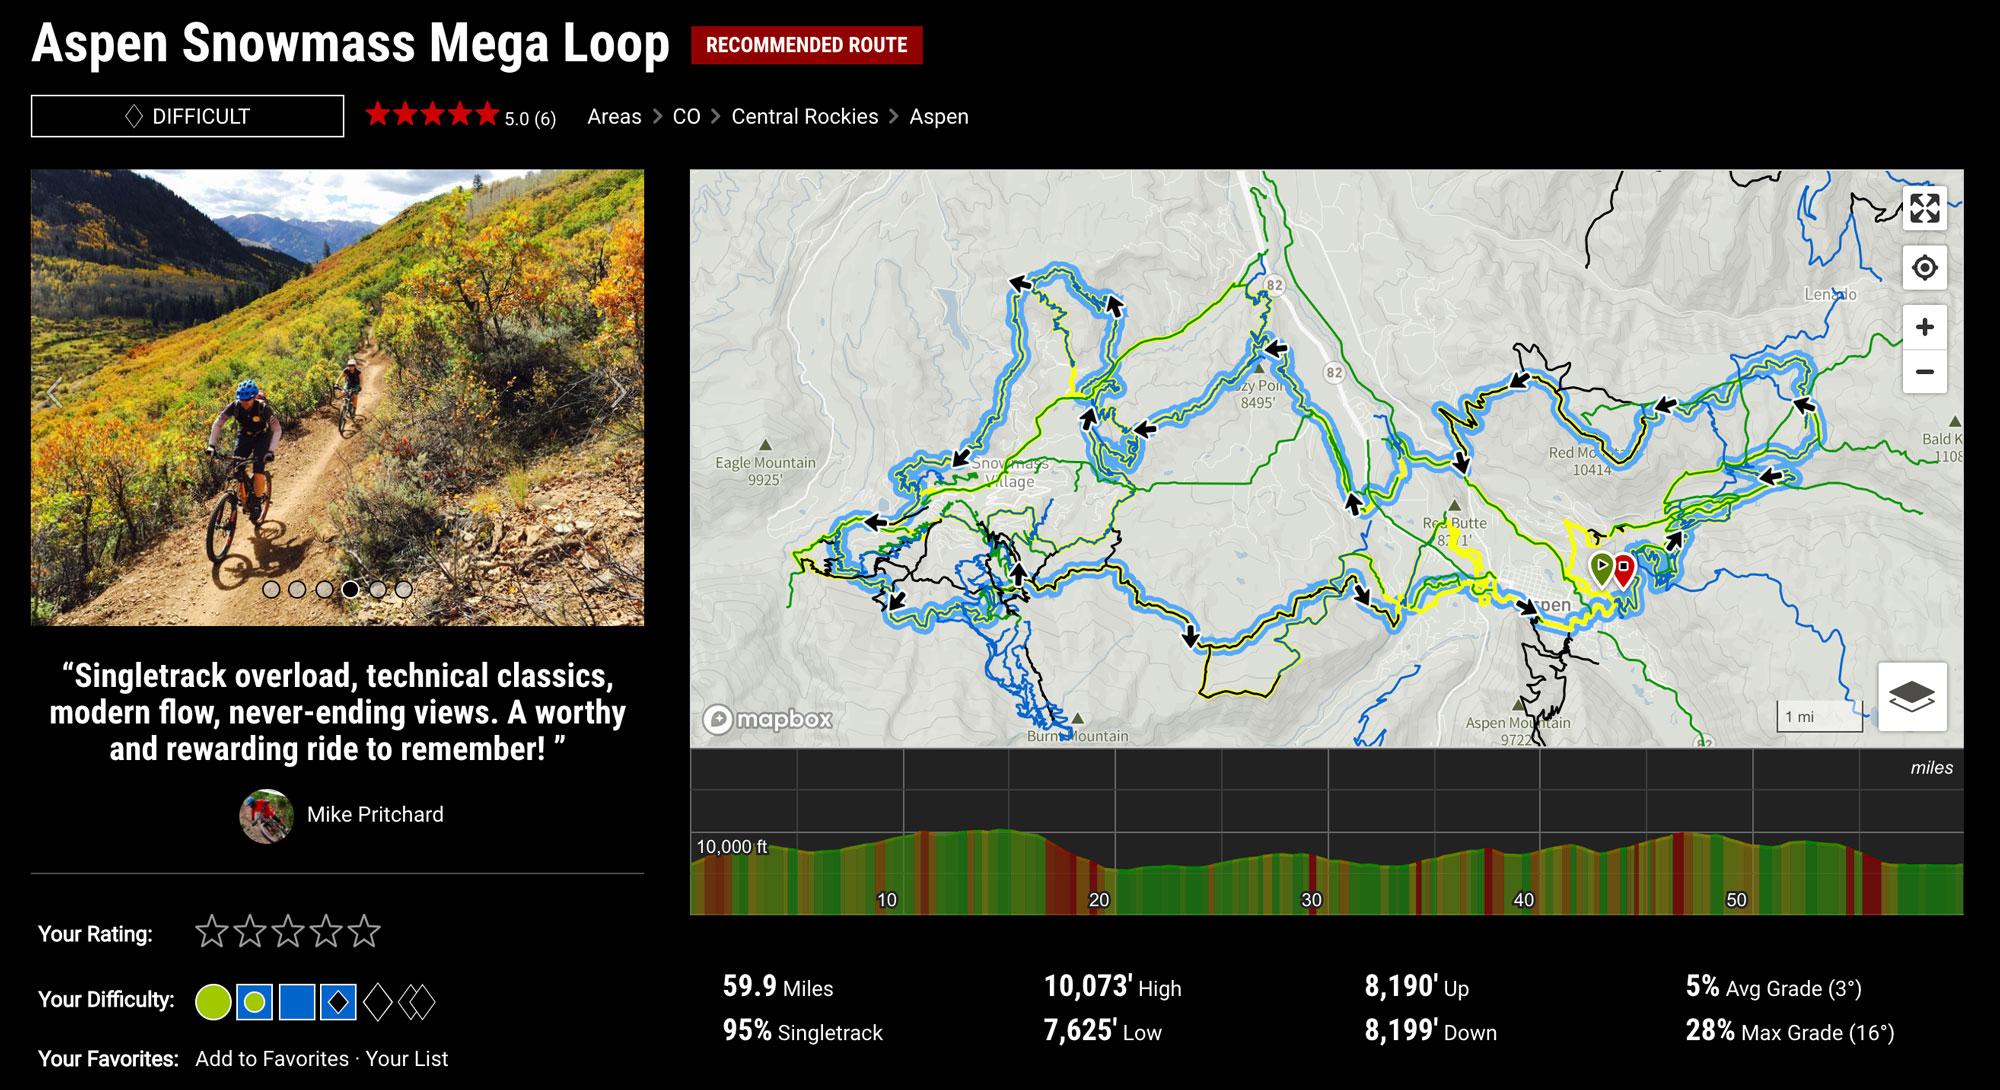 Aspen Snowmass Mega Loop